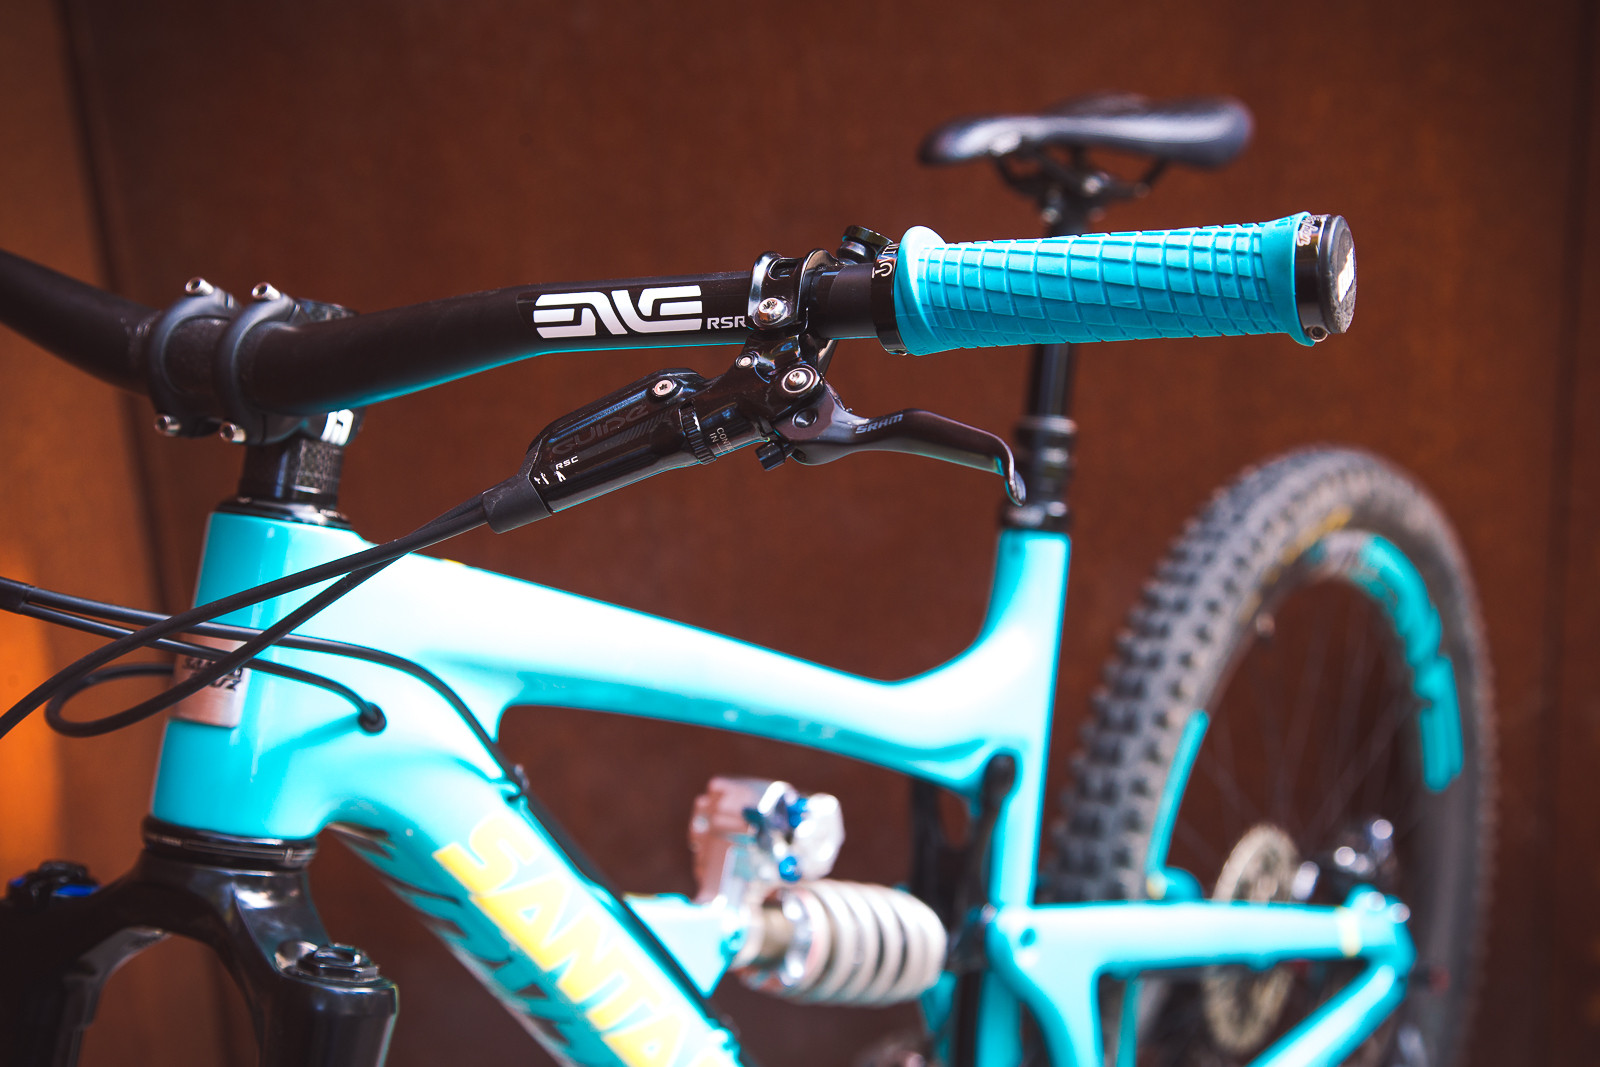 bbd1e9fe756 ENVE Composites Mountain Riser Handlebar - Reviews, Comparisons ...